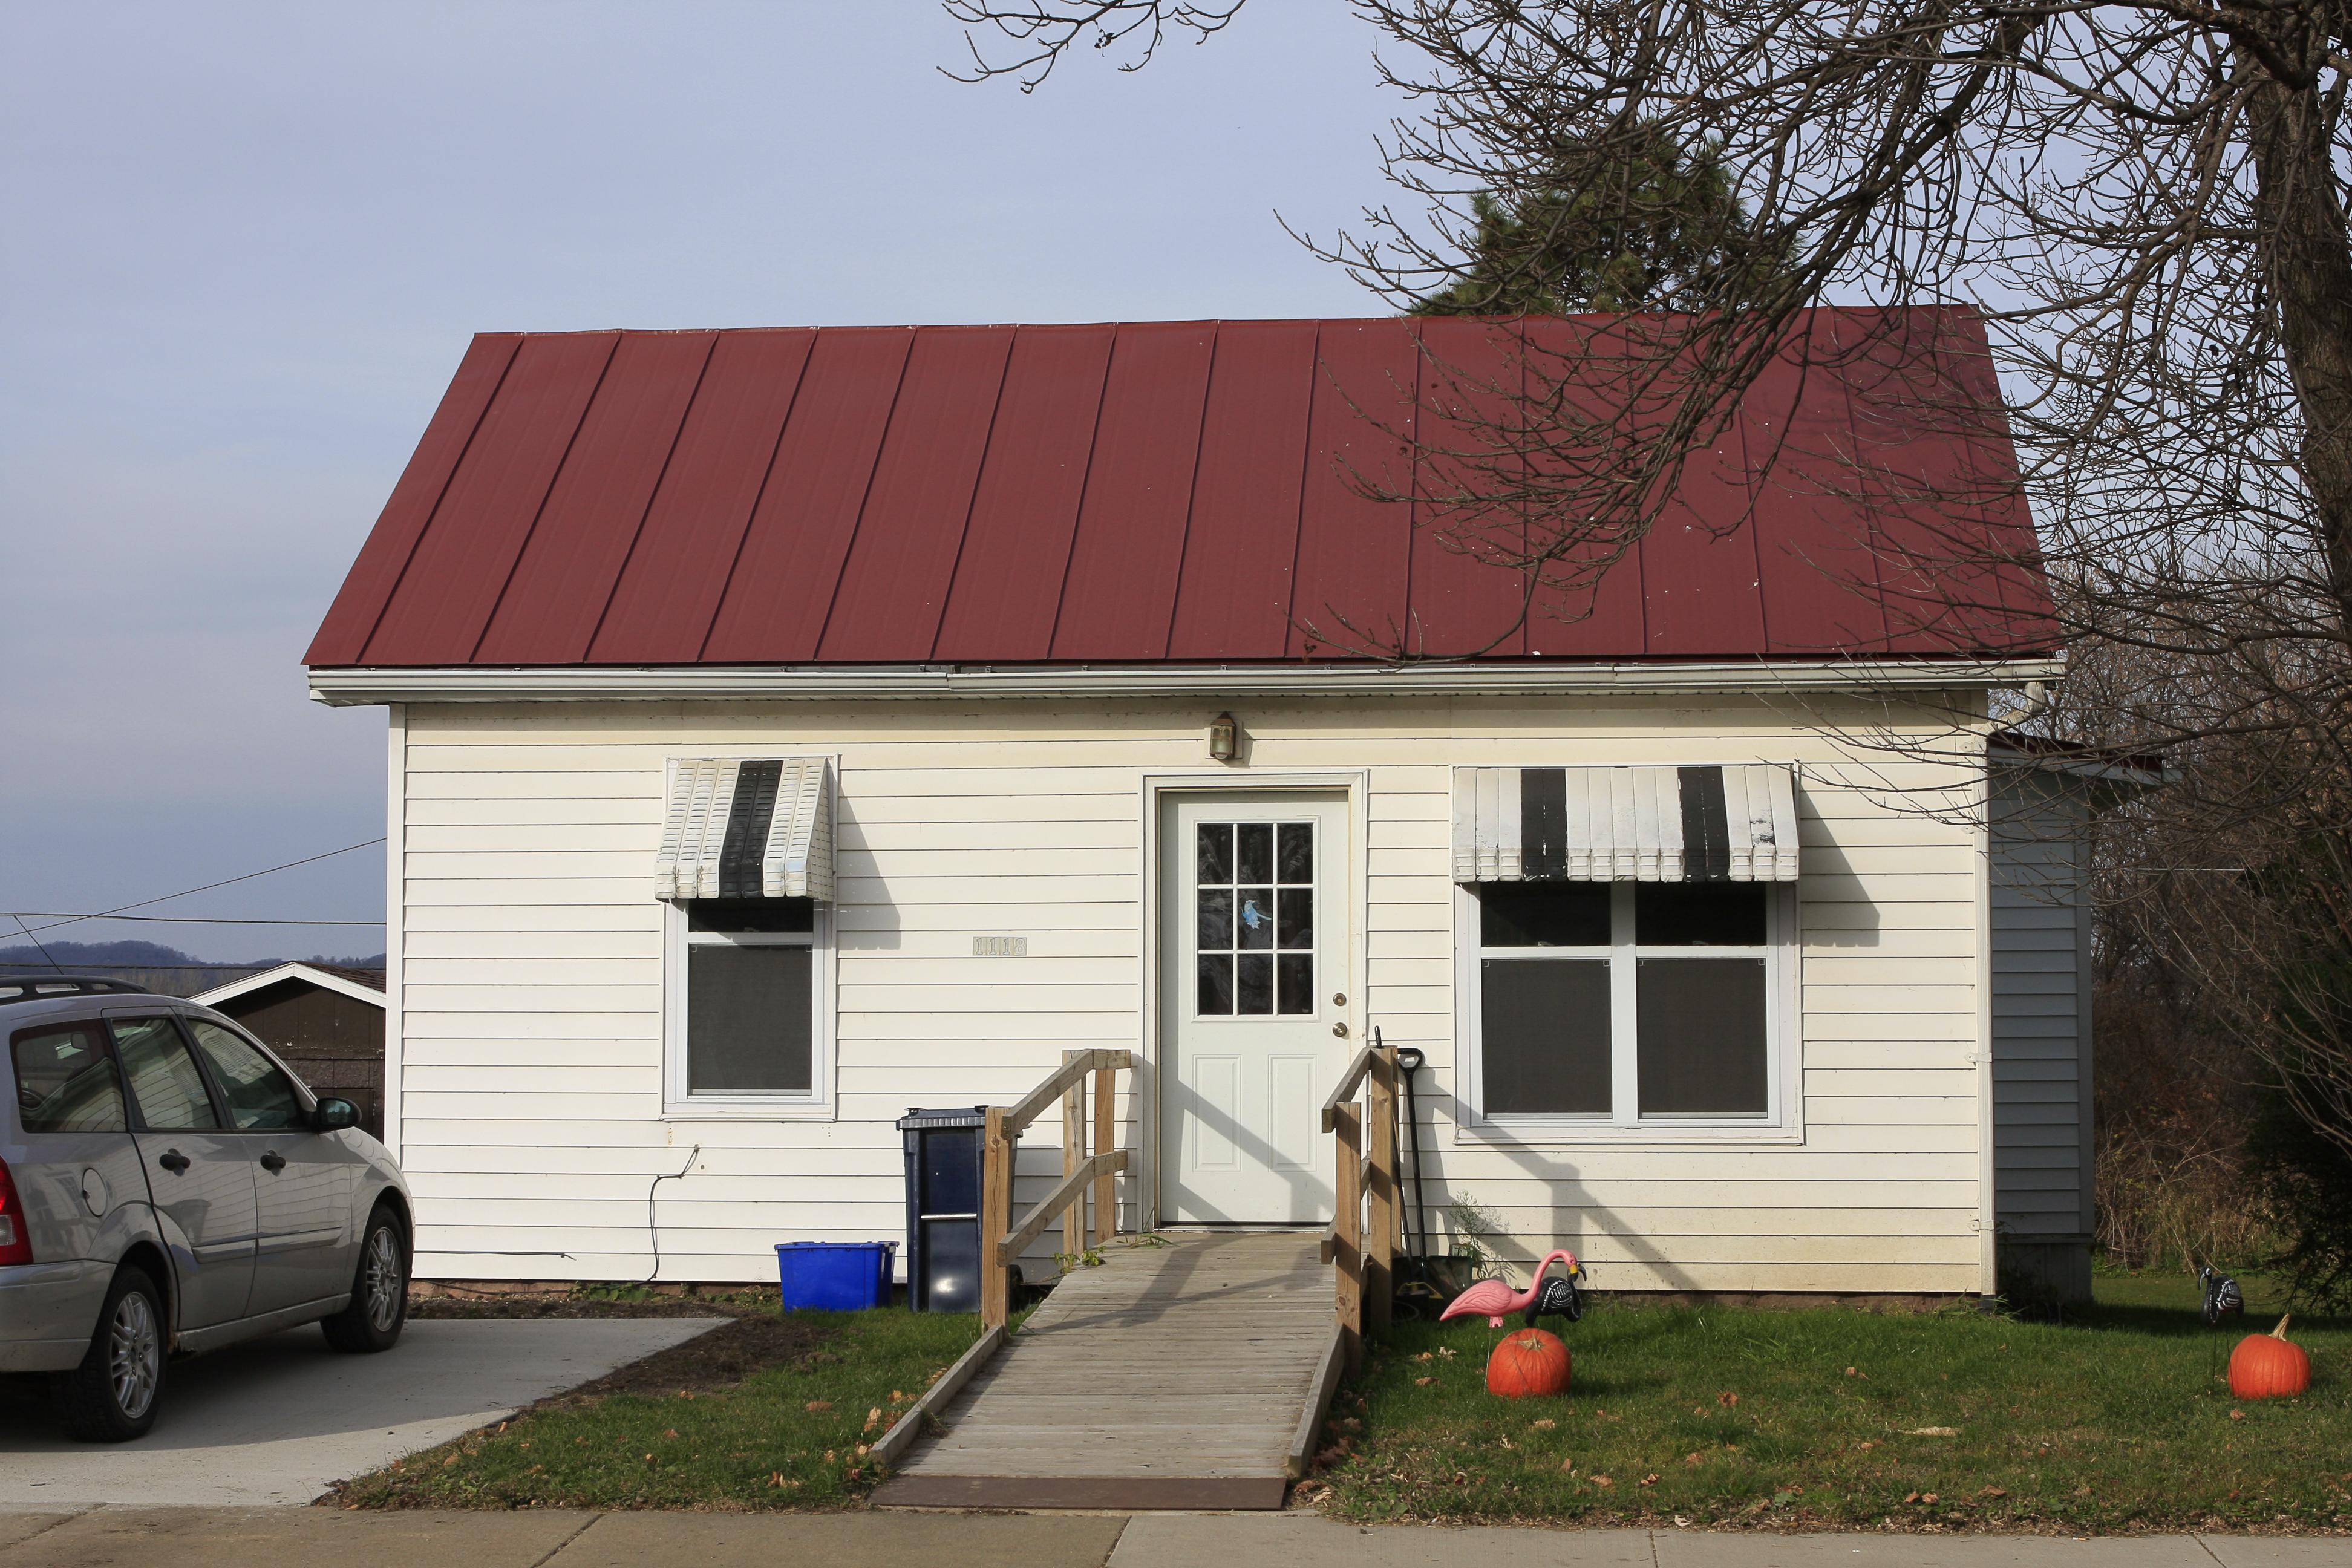 sheet Metal Roofing red colonial residential house wisconsin iowa illinois minnesota north dakota standing seam